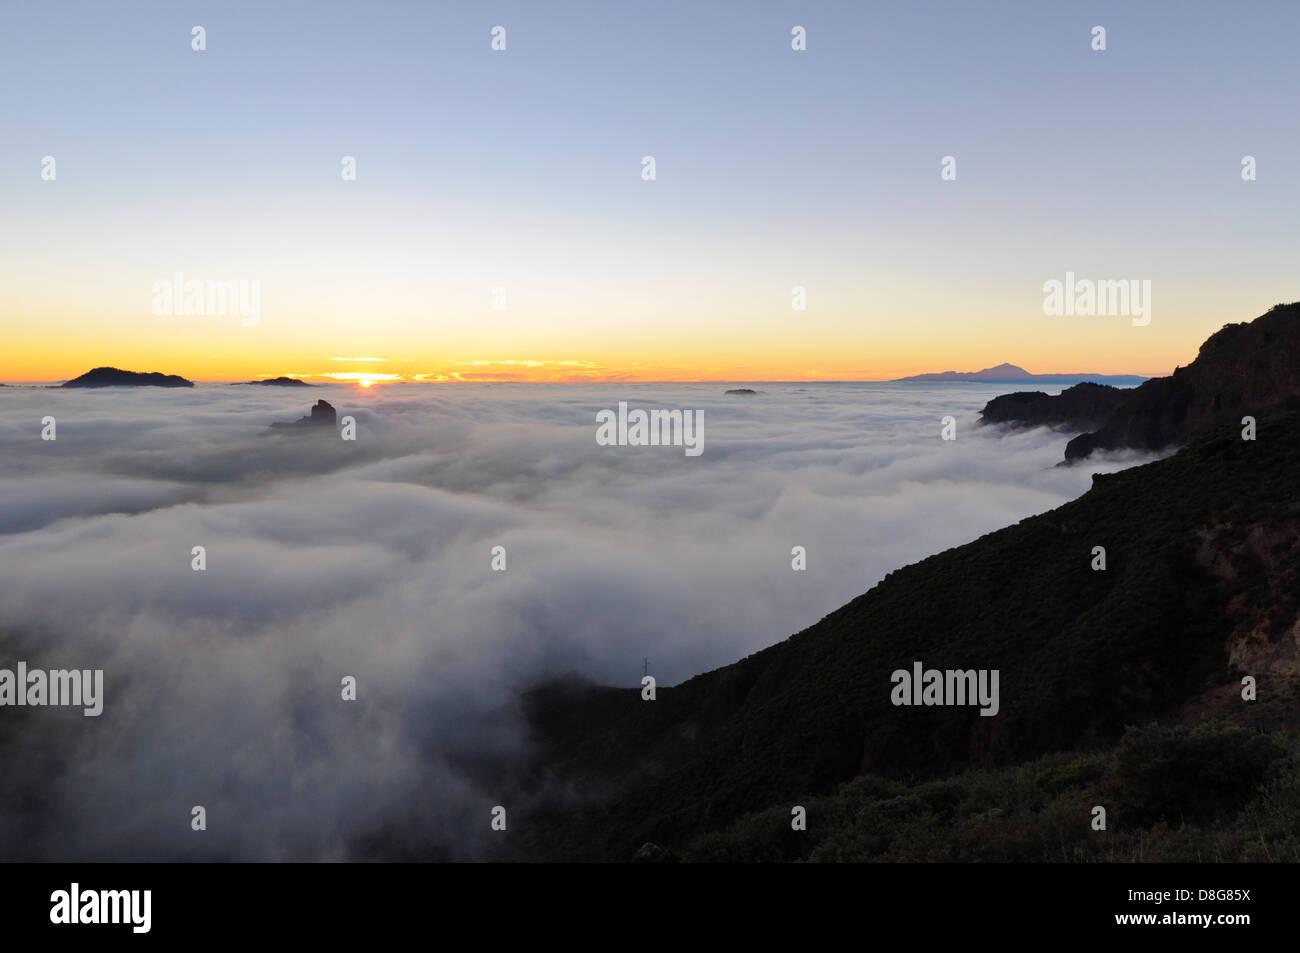 Lookout Cruz de Tejeda with view at Teide volcano, Gran Canaria, Canary Islands, Spain, Europe - Stock Image